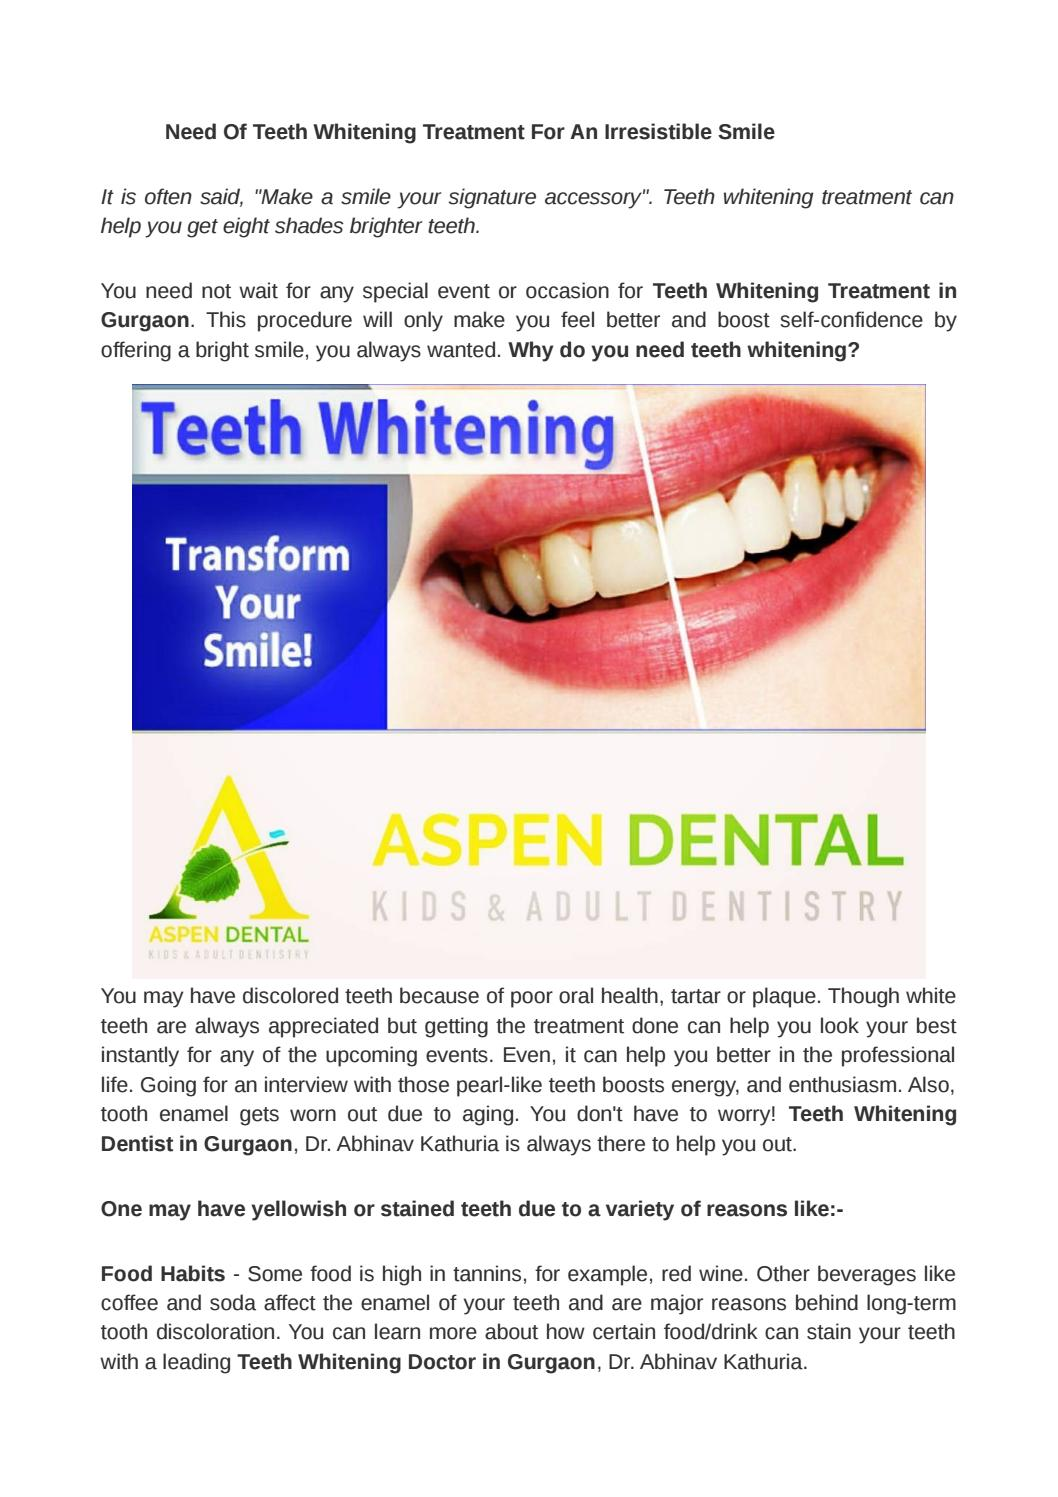 Aspen Dental Price List : aspen, dental, price, Teeth, Whitening, Aspen, Dental, TeethWalls